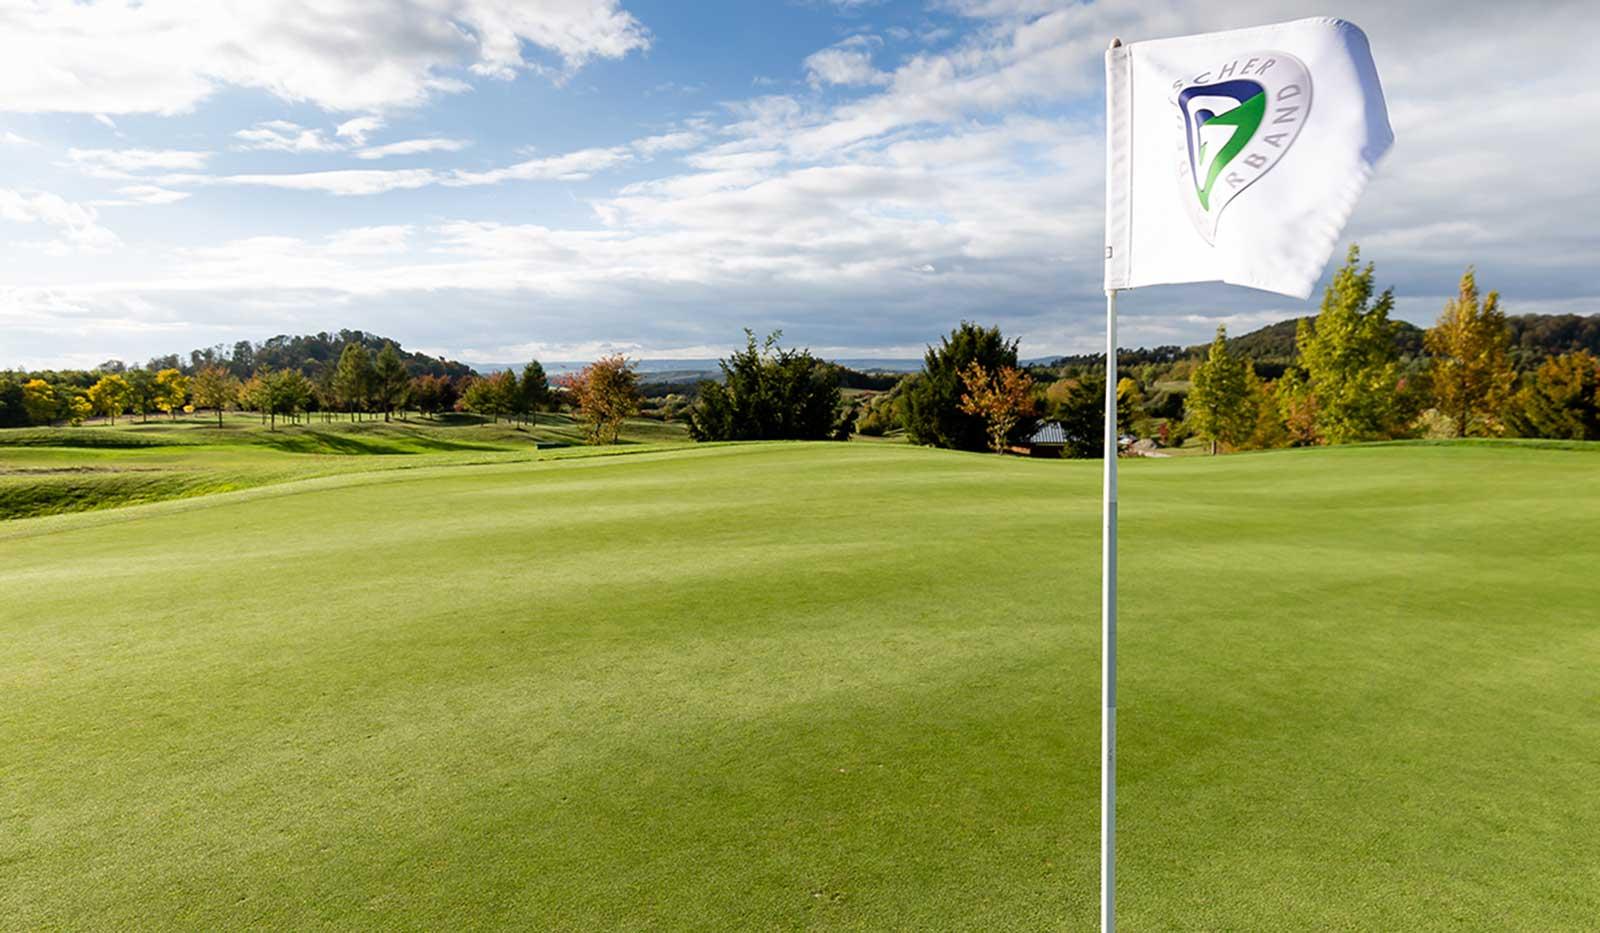 Golfplatz mit DGV Flagge